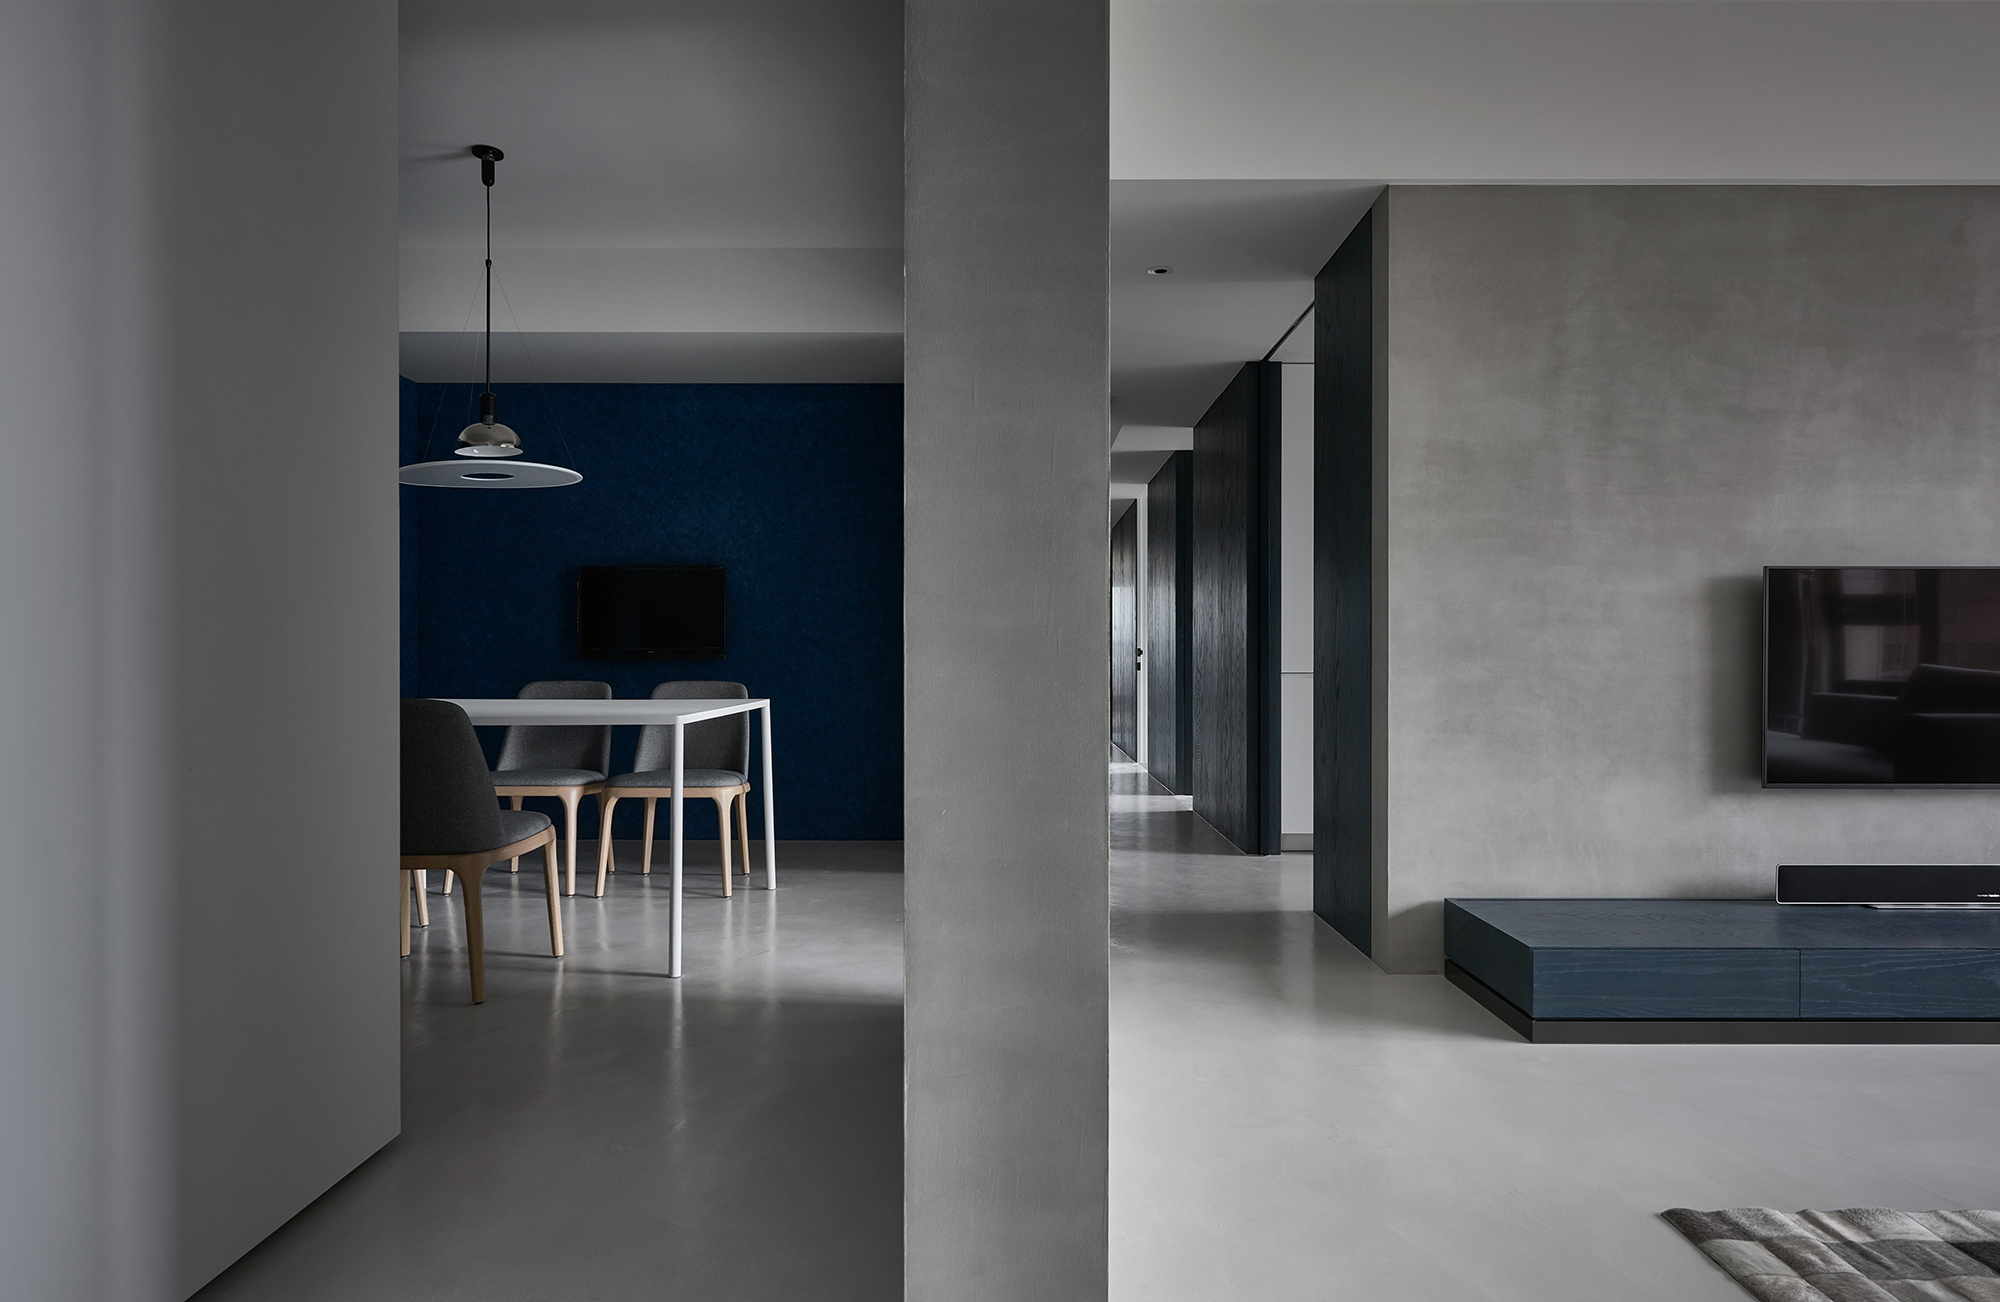 boundary wei yi international design associates archdaily. Black Bedroom Furniture Sets. Home Design Ideas